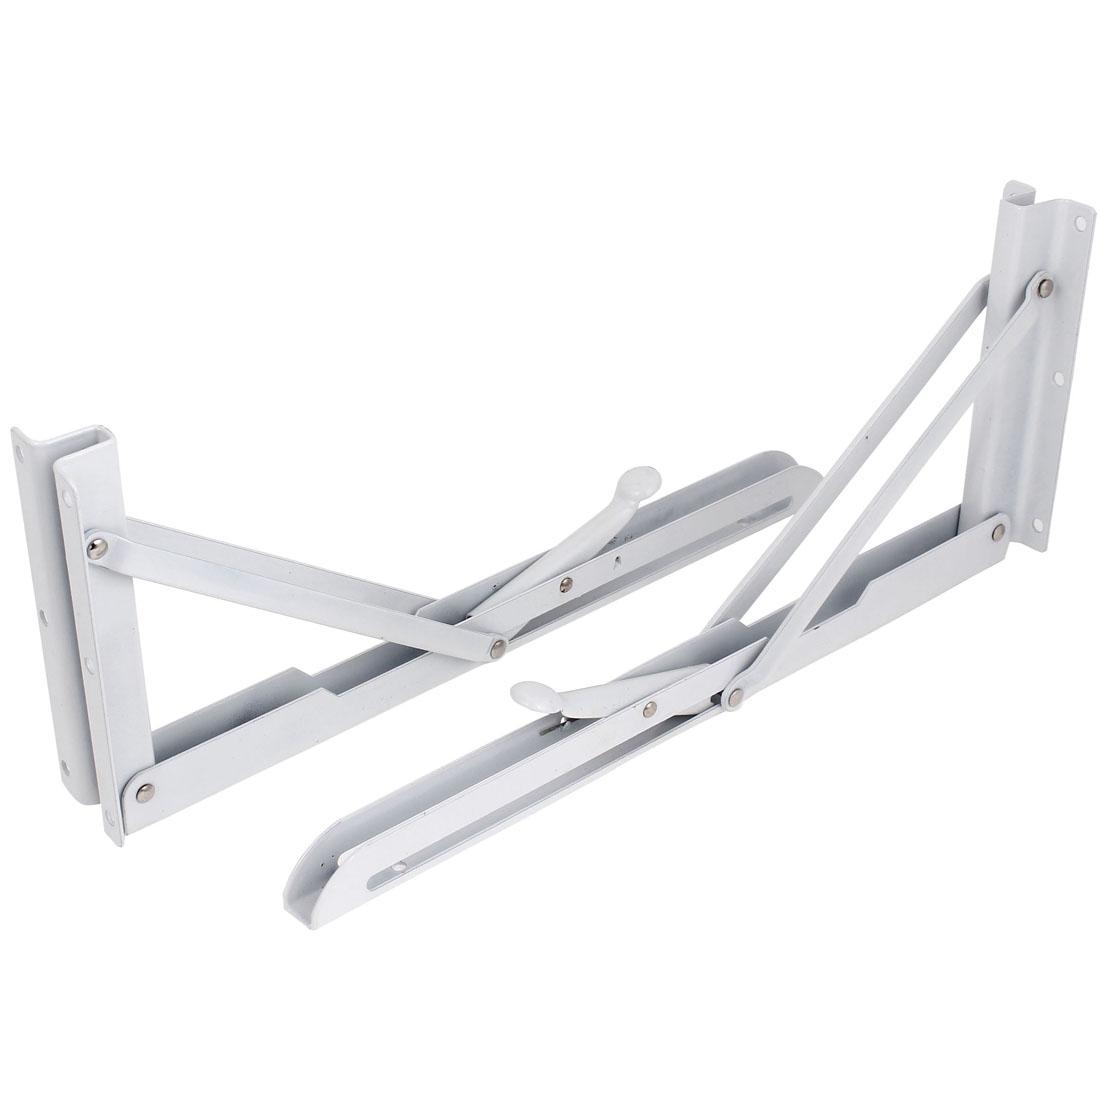 "White Painted Metal 90 Degree Angle Support Folding Shelf Bracket 14"" Long 2pcs"